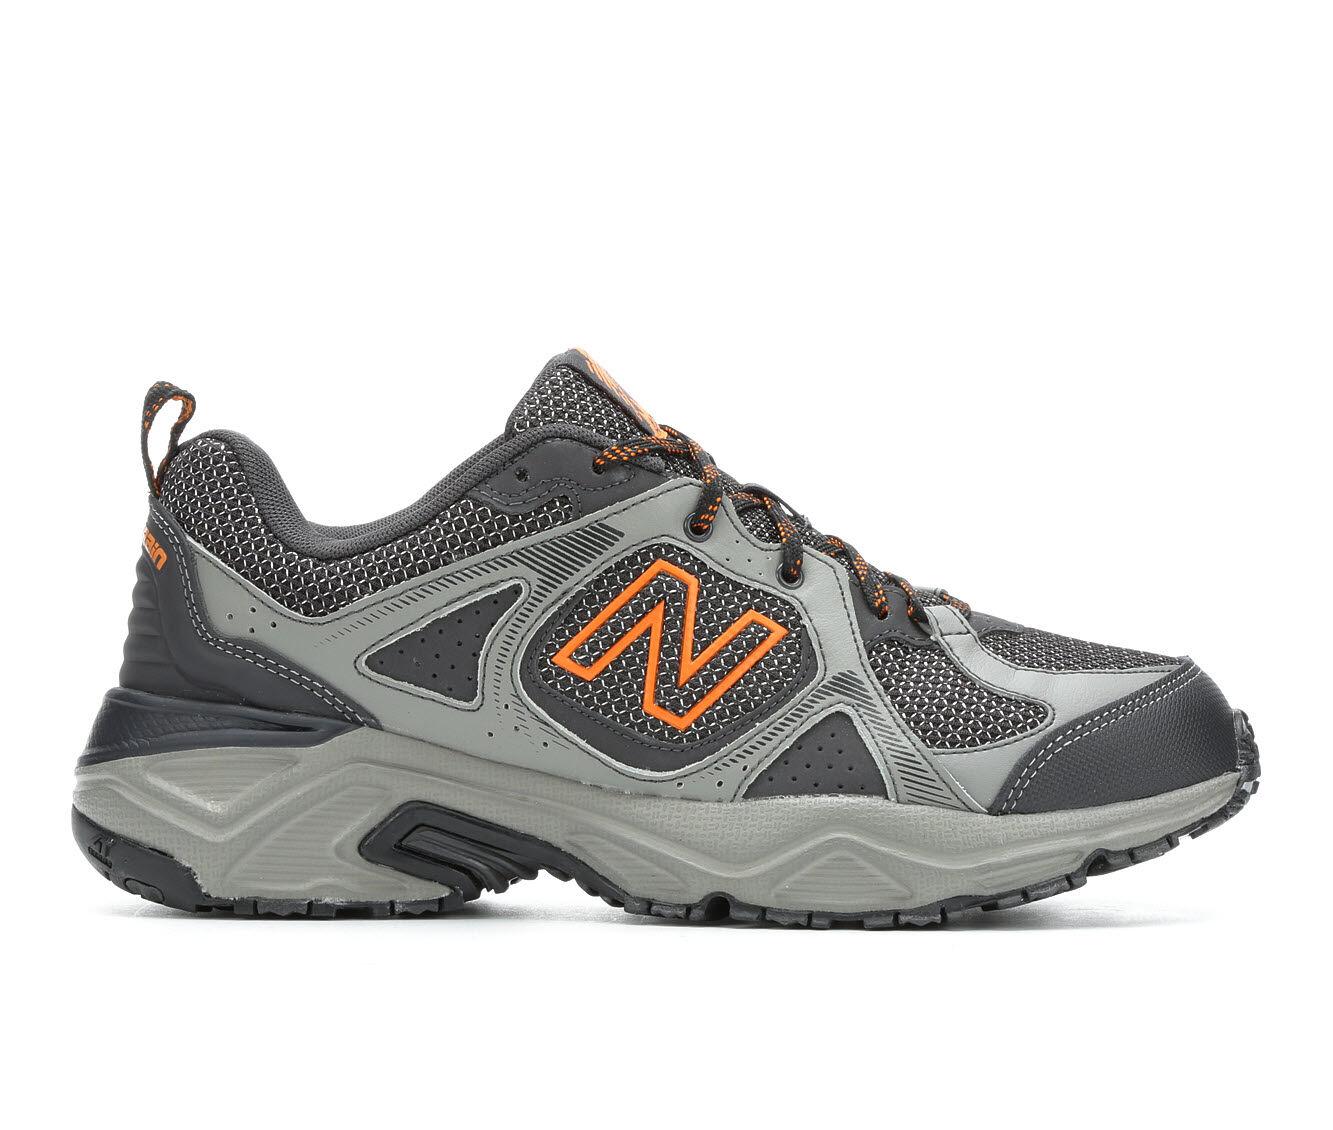 Men's New Balance MT481 Trail Running Shoes Grey/Blk/Org